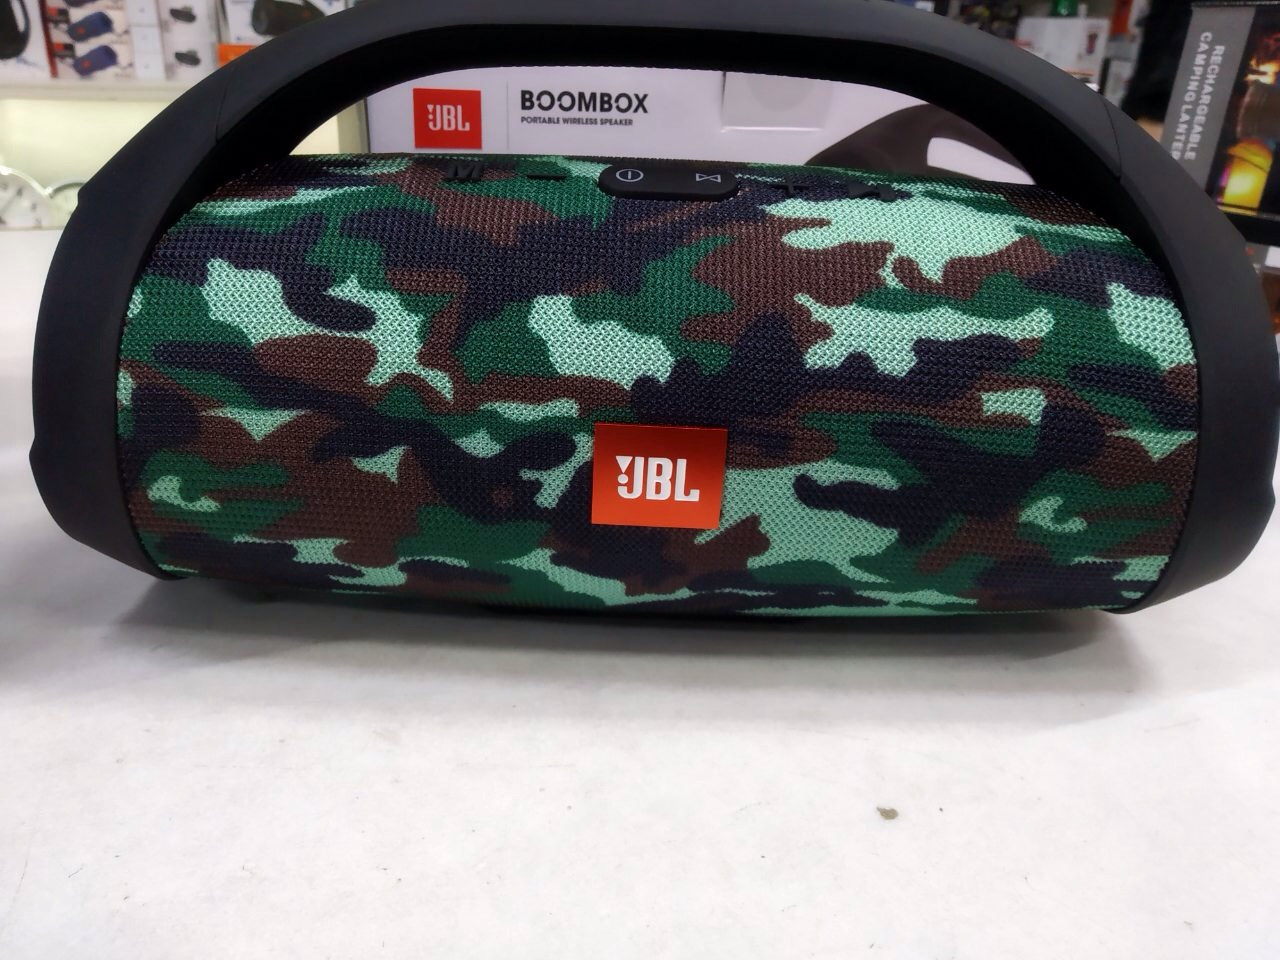 Колонка JBL BOOMBOX PORTABLE WIRELES SPEKE MP3 FM USB (качественная копия JBL) камуфляж